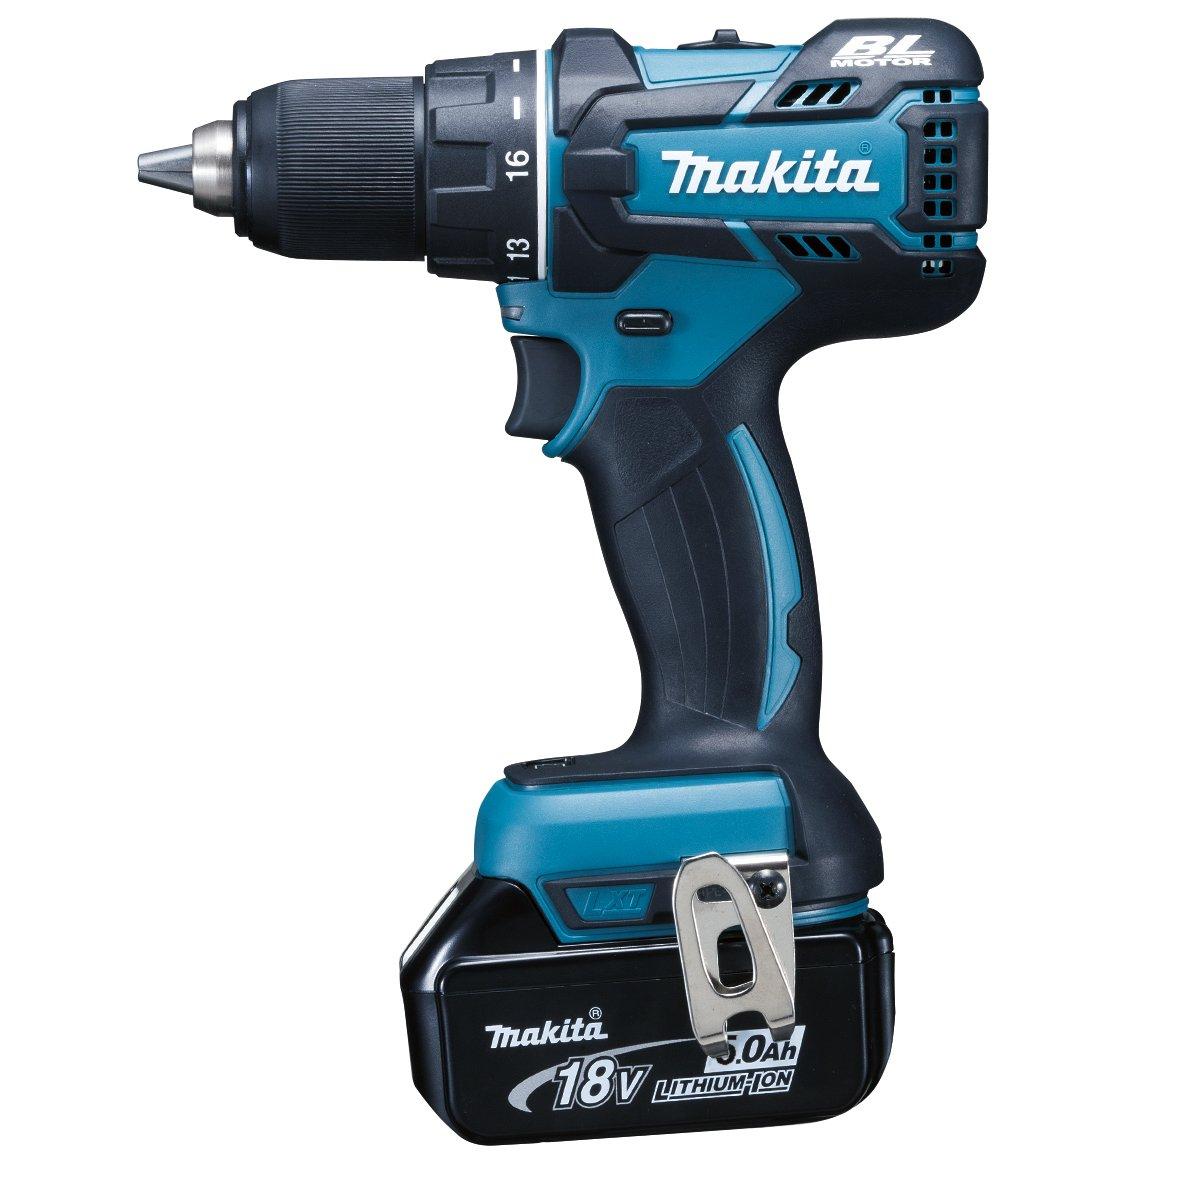 1,3 cm, 3,8 cm, 54 Nm, 36 Nm, 400 RPM, 1550 RPM Azul 1,8 kg Taladro el/éctrico Makita DDF480RMJ drill Sin llave Negro